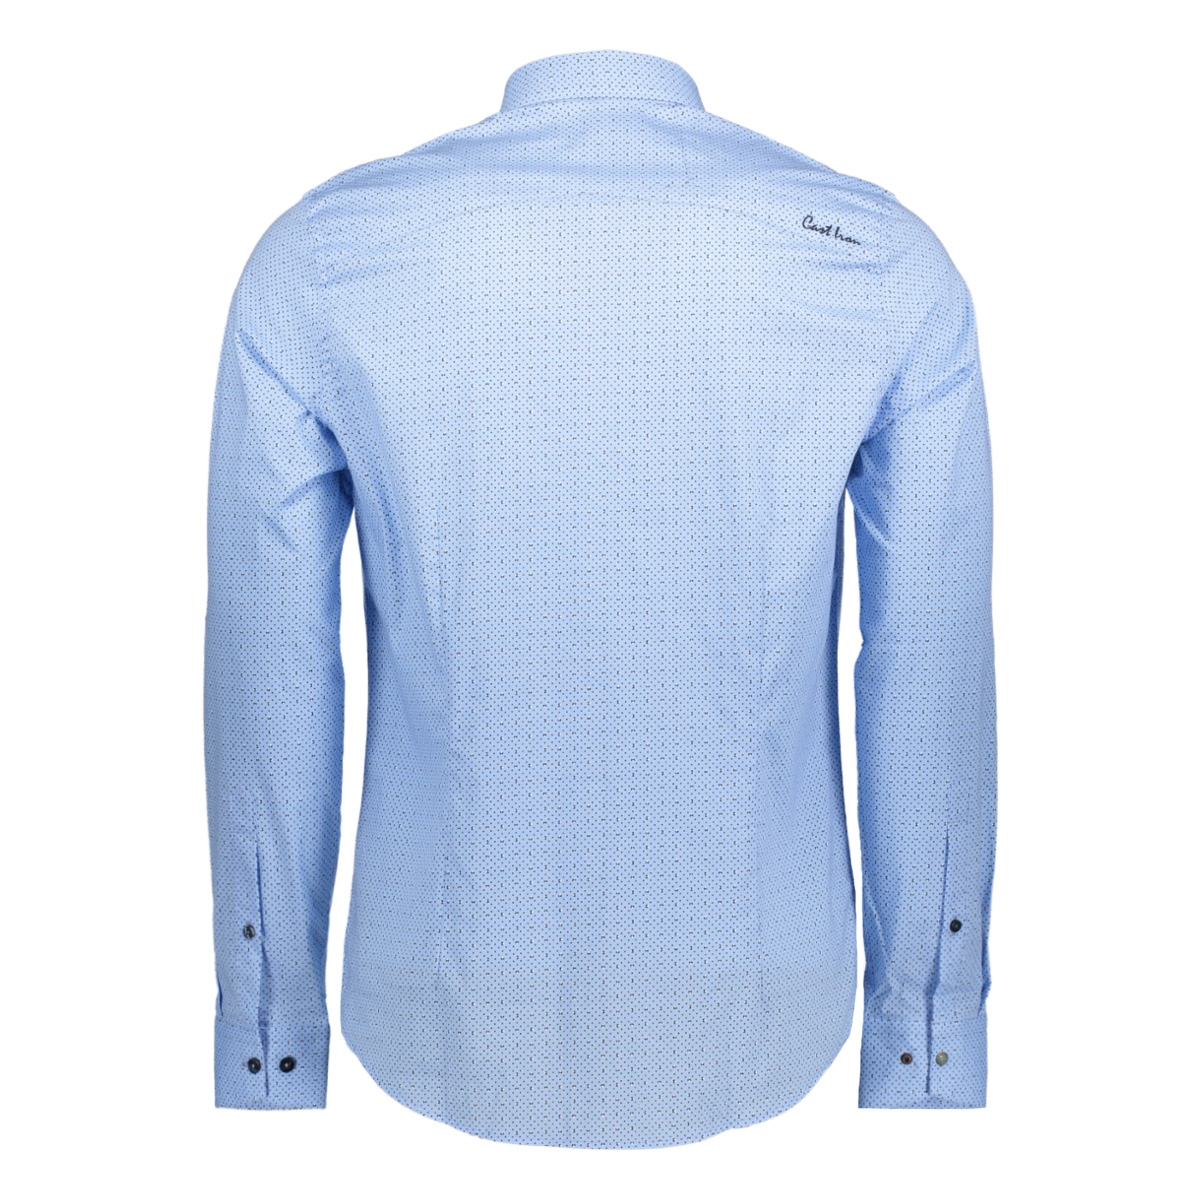 csi175602 cast iron overhemd 5279